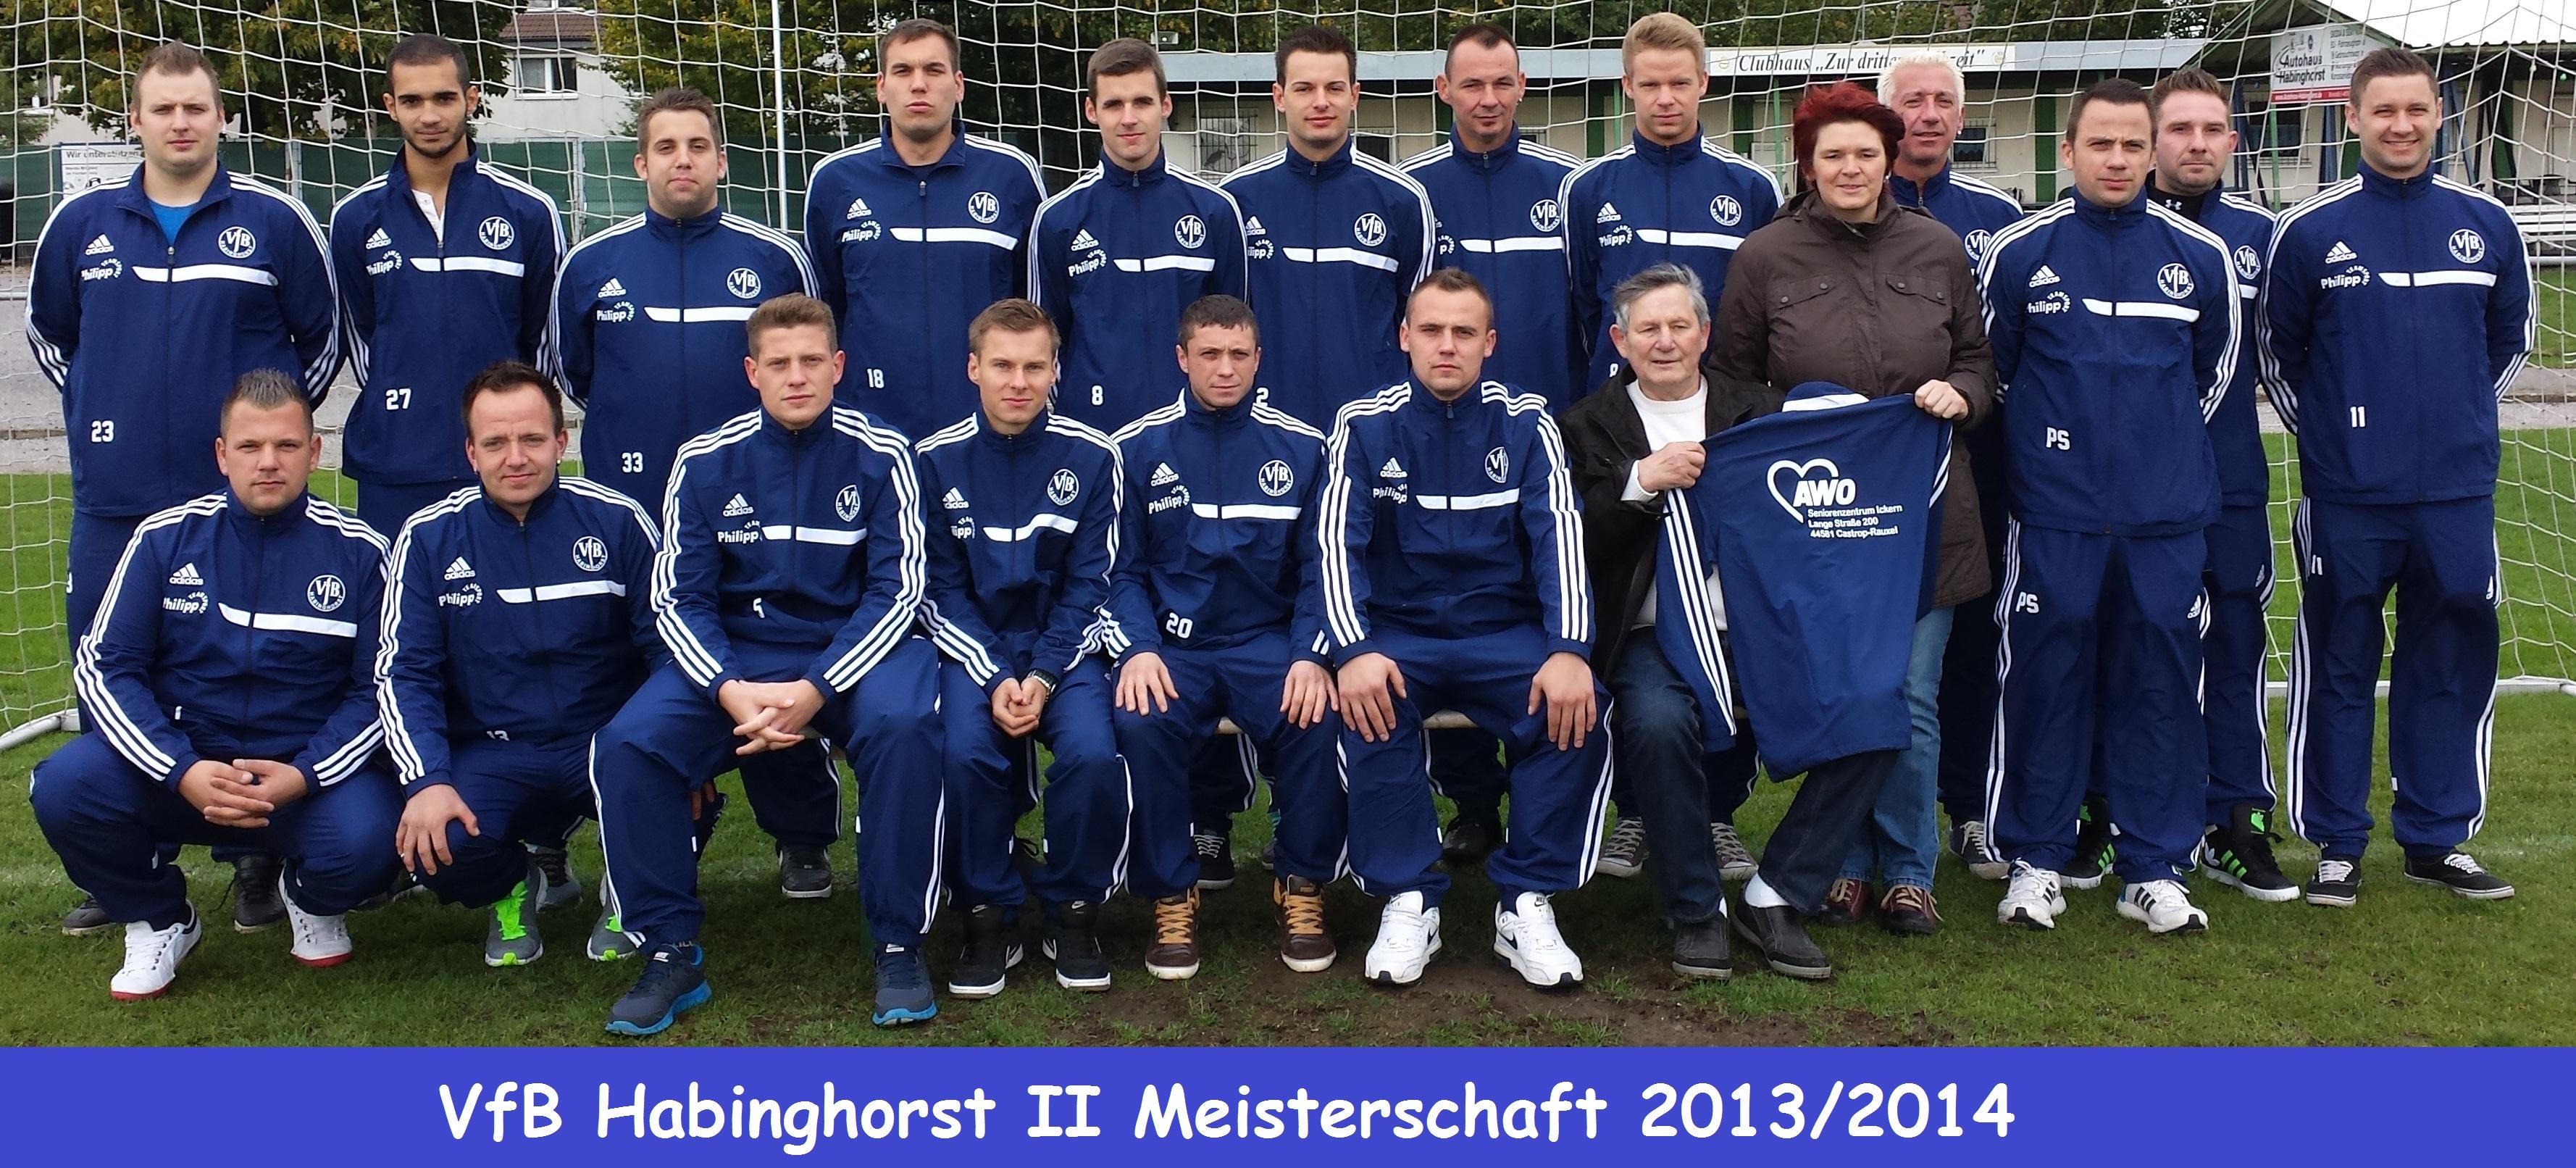 Vfb Habinghorst